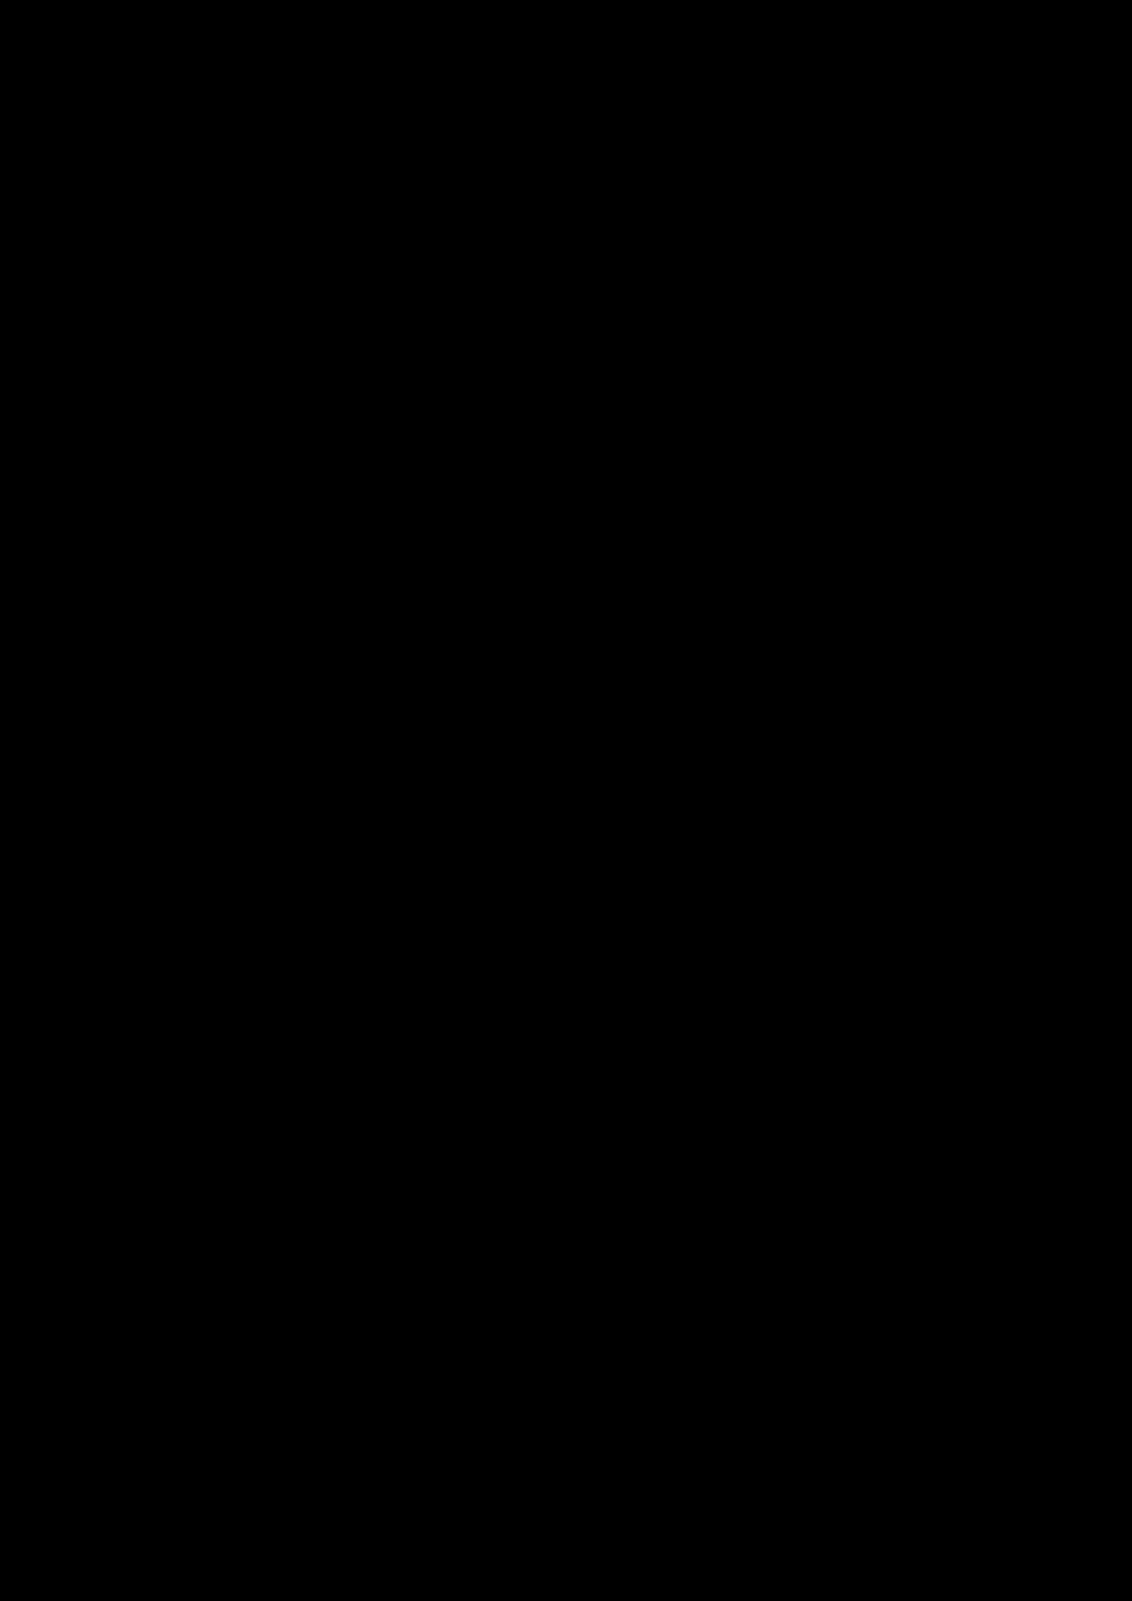 Okean Pustotyi slide, Image 19